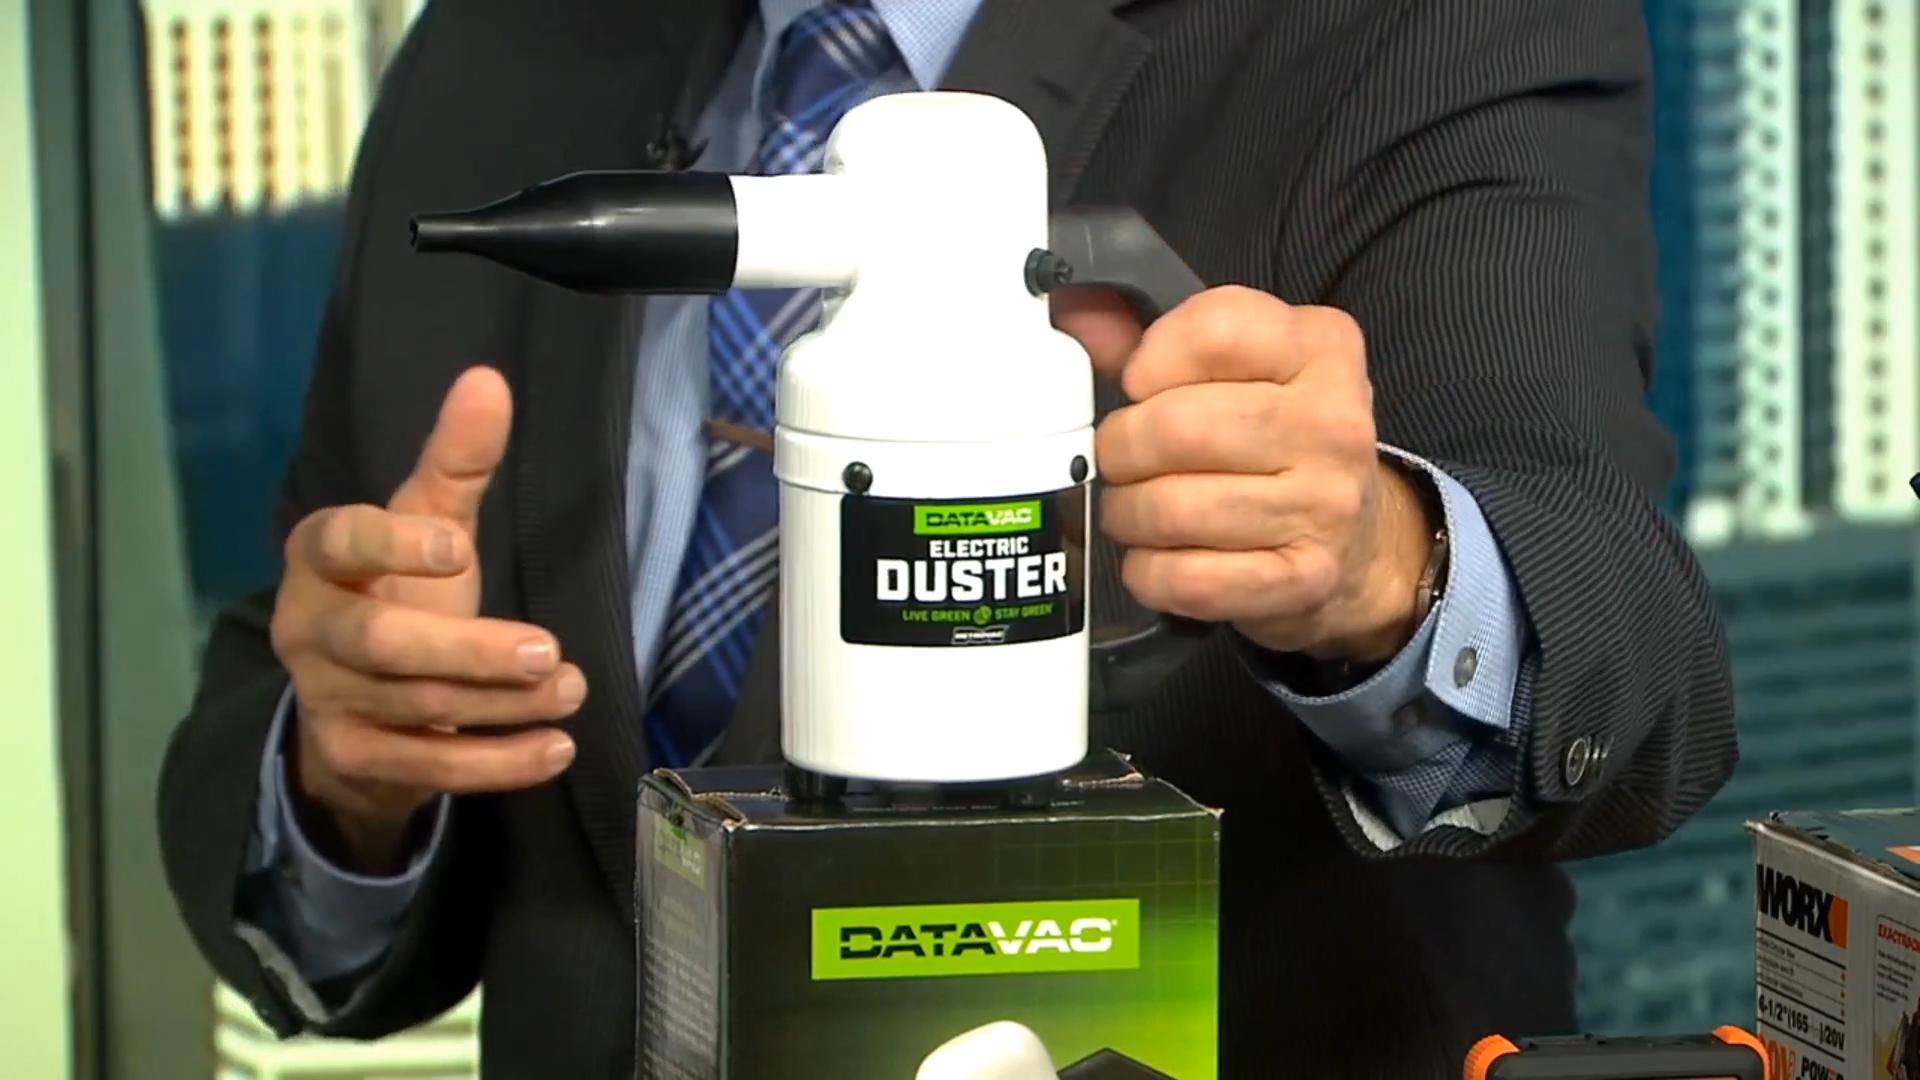 METROPOLITAN DATAVAC ELECTRIC DUSTER - $100.00Shop Now